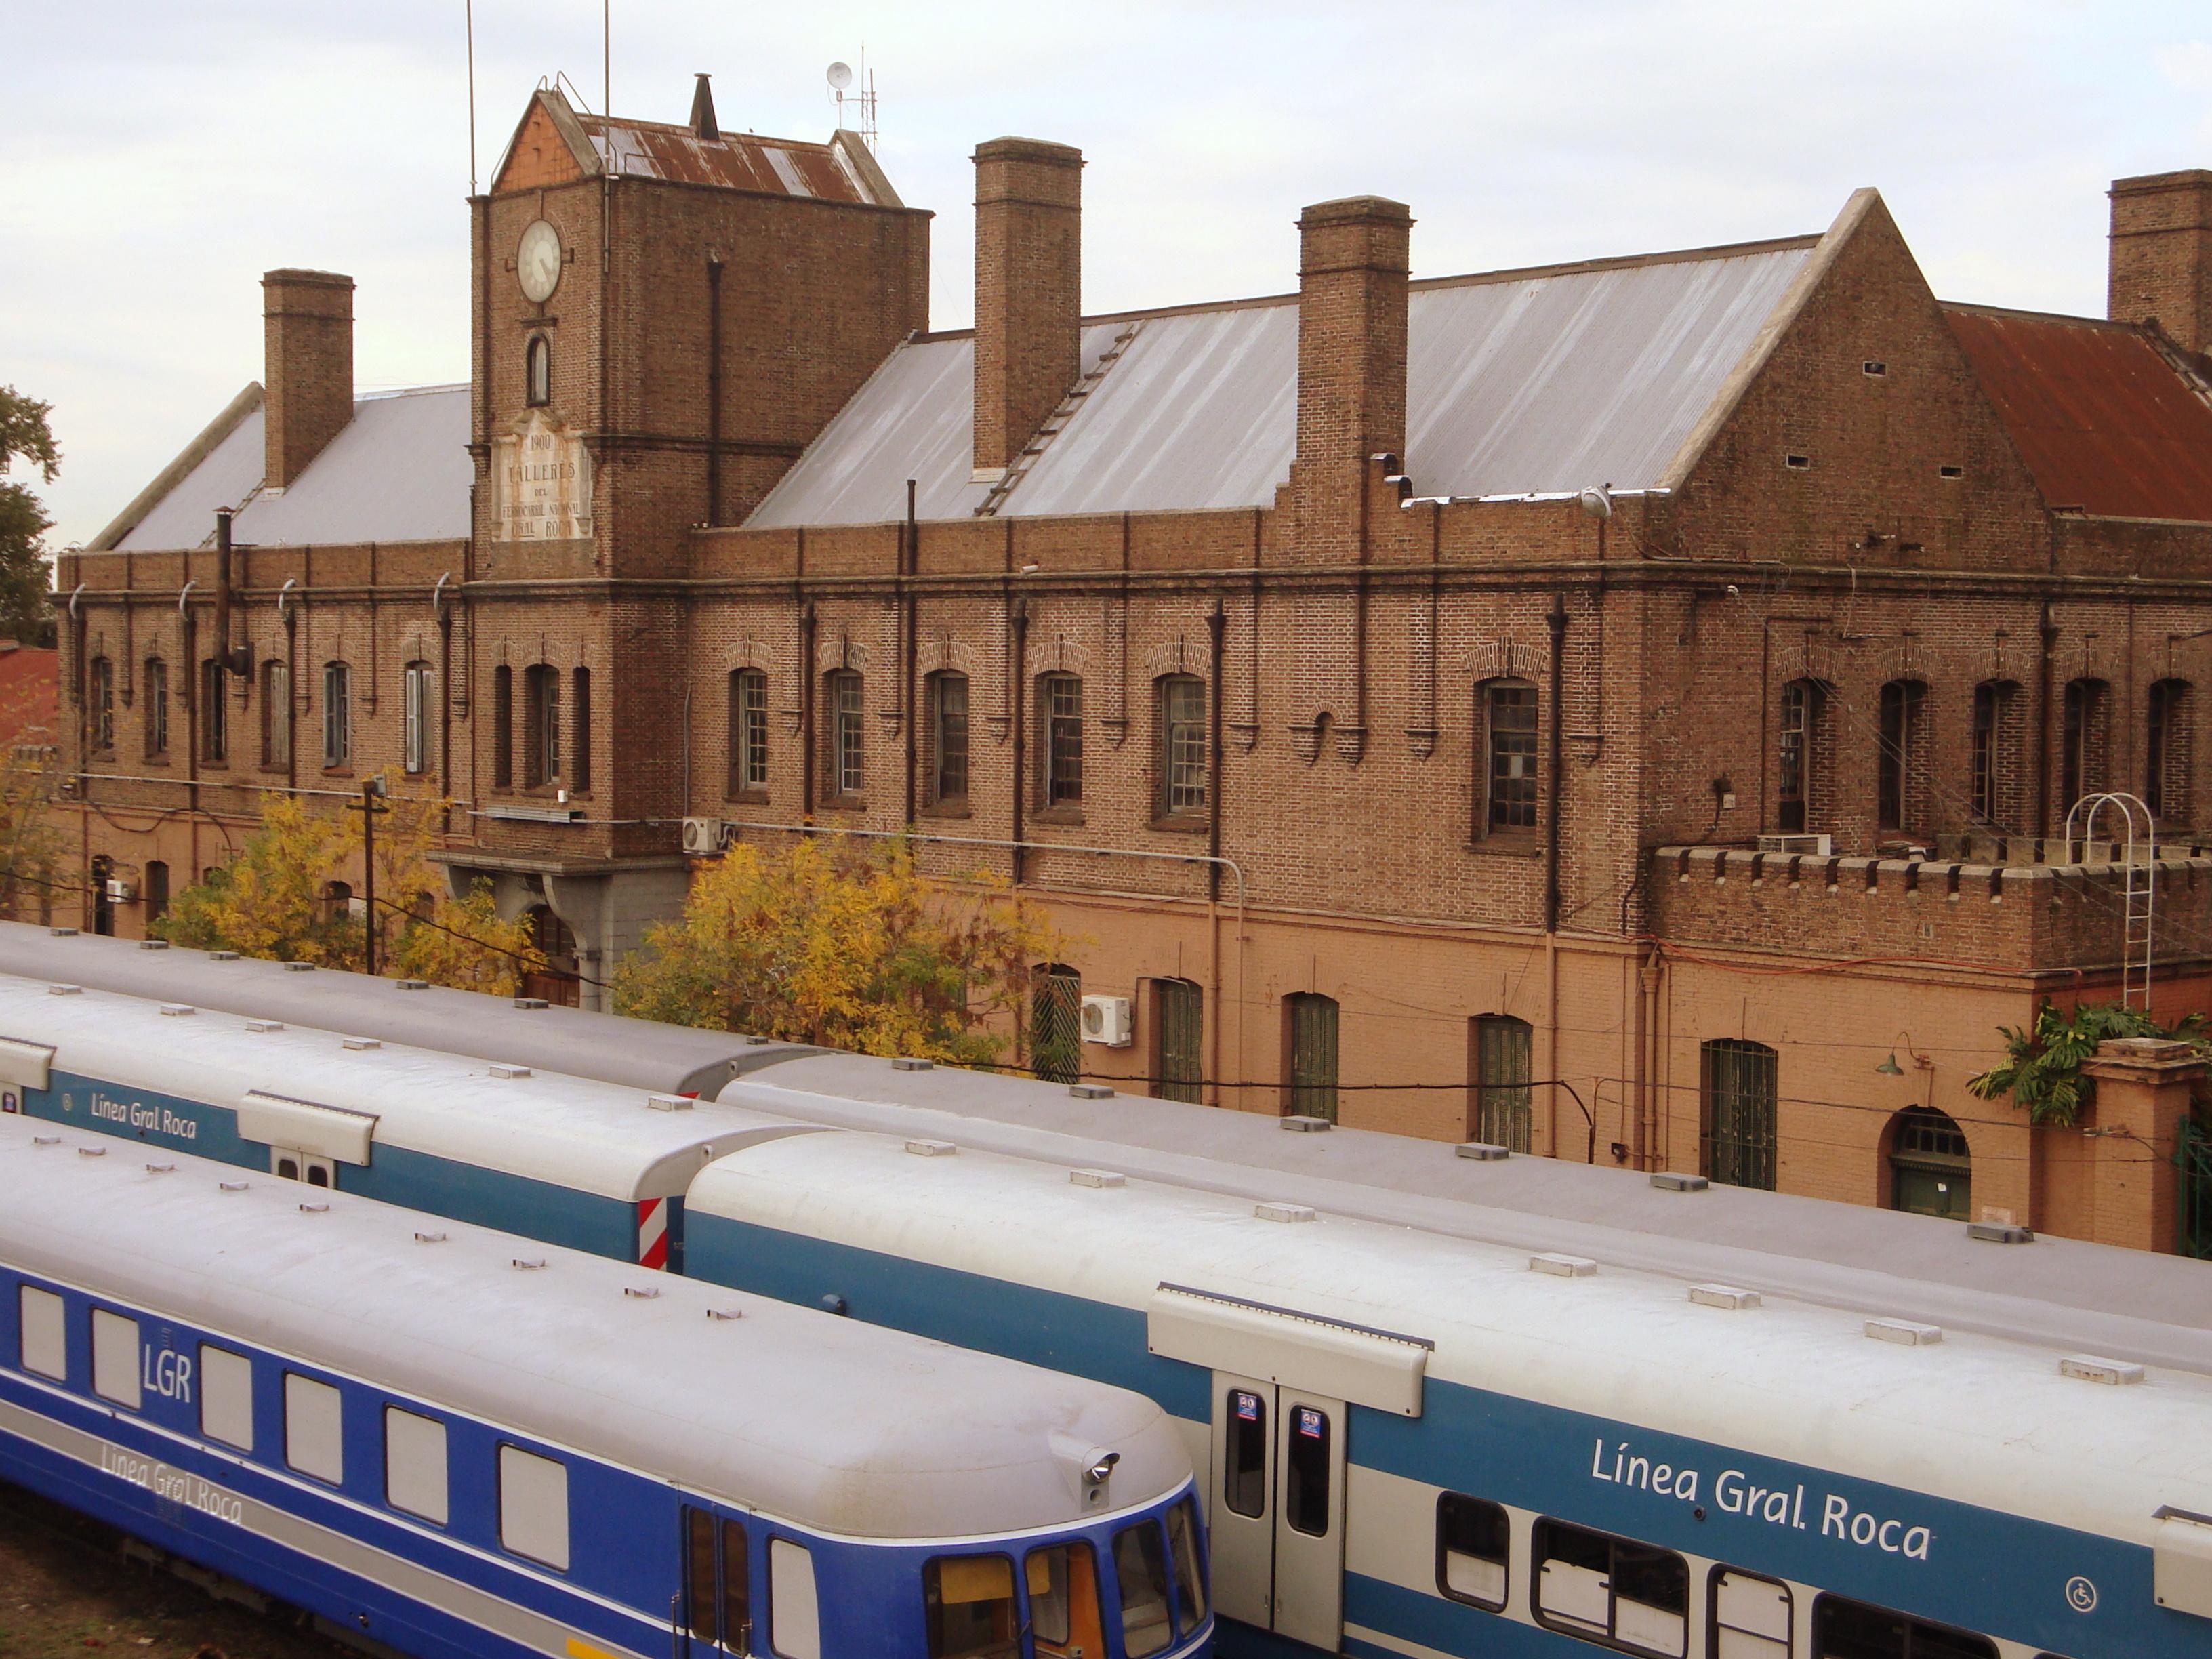 http://upload.wikimedia.org/wikipedia/commons/b/bd/Talleres_ferroviarios_de_Remedios_de_Escalada.jpg